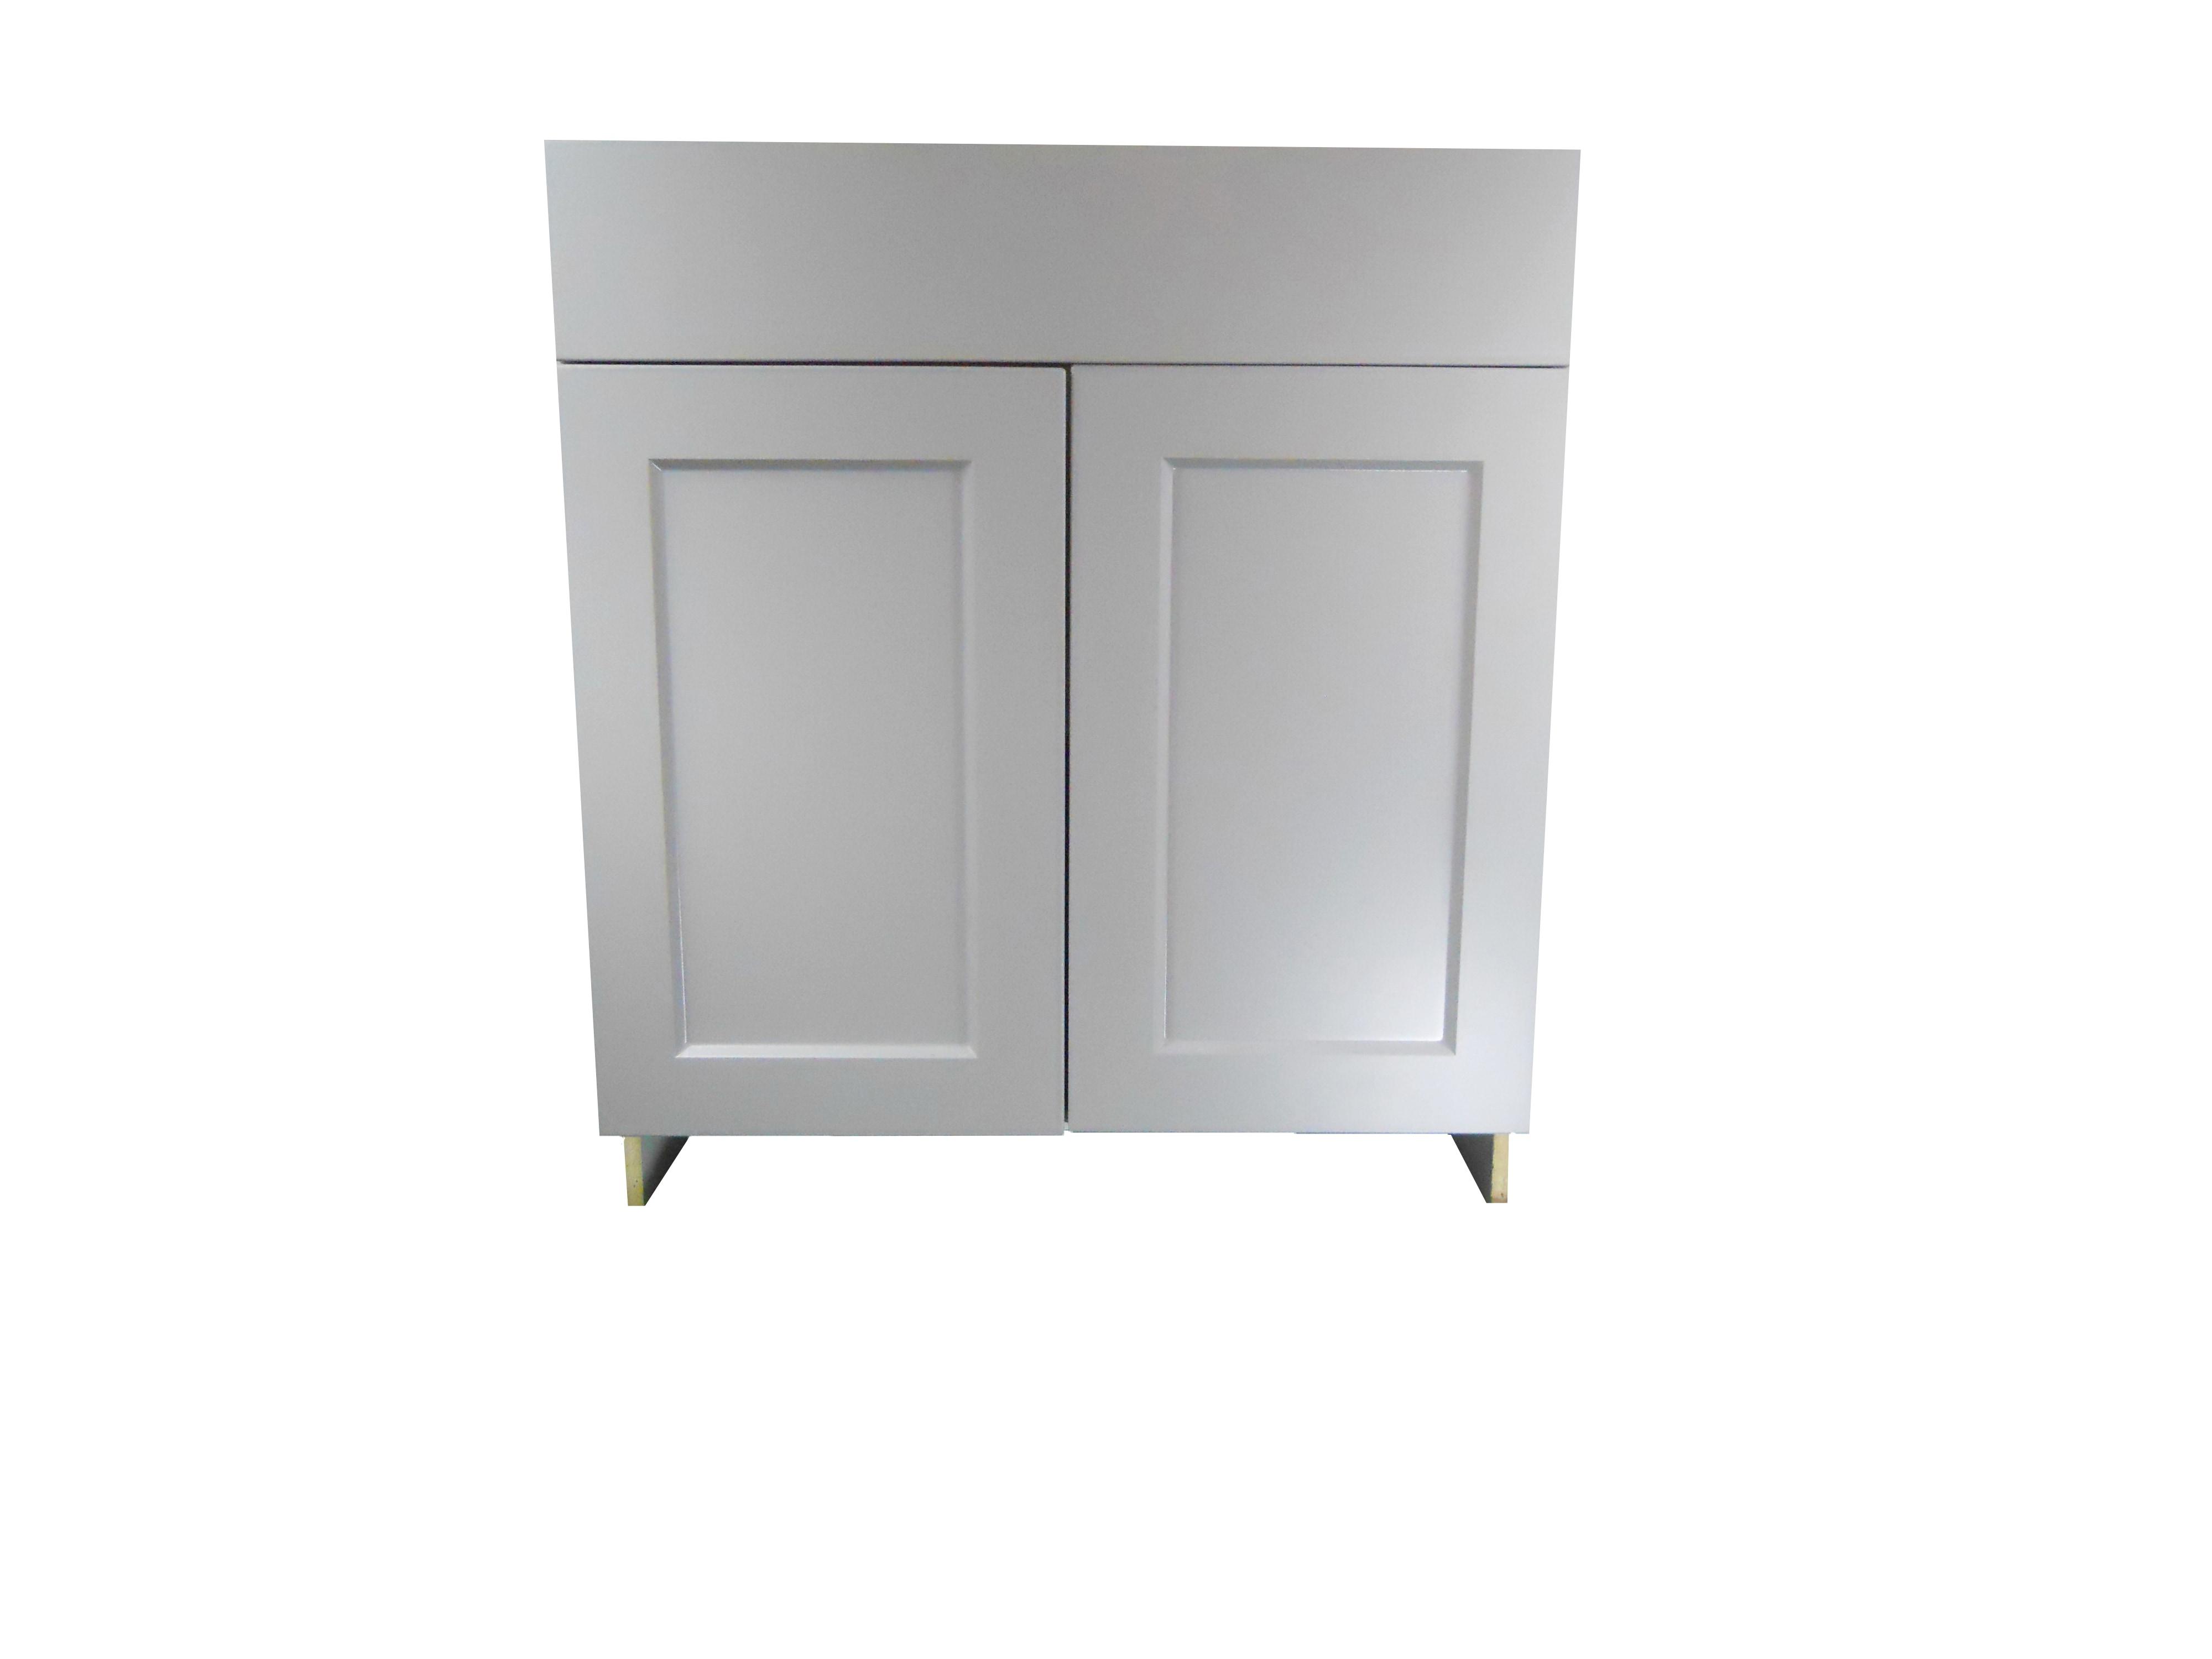 Base Cabinet with Drawer/2 Door / Whistler Grey / Flat Panel Grey / 27 Whistler Grey 0